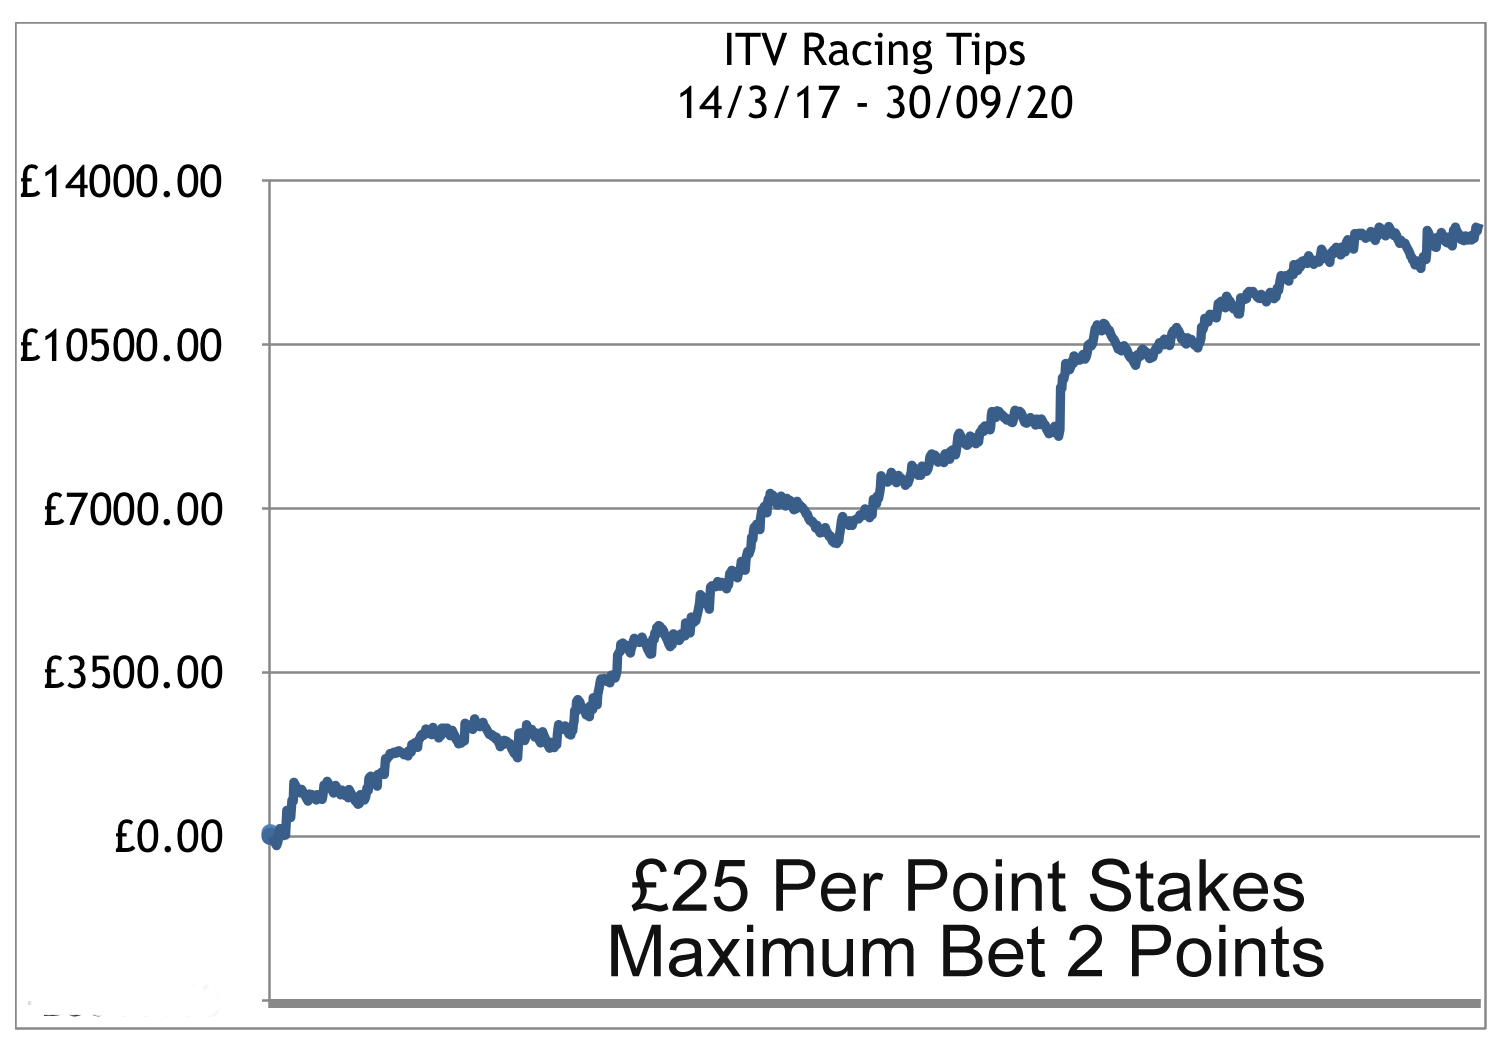 ITV Racing Tips Profit Chart